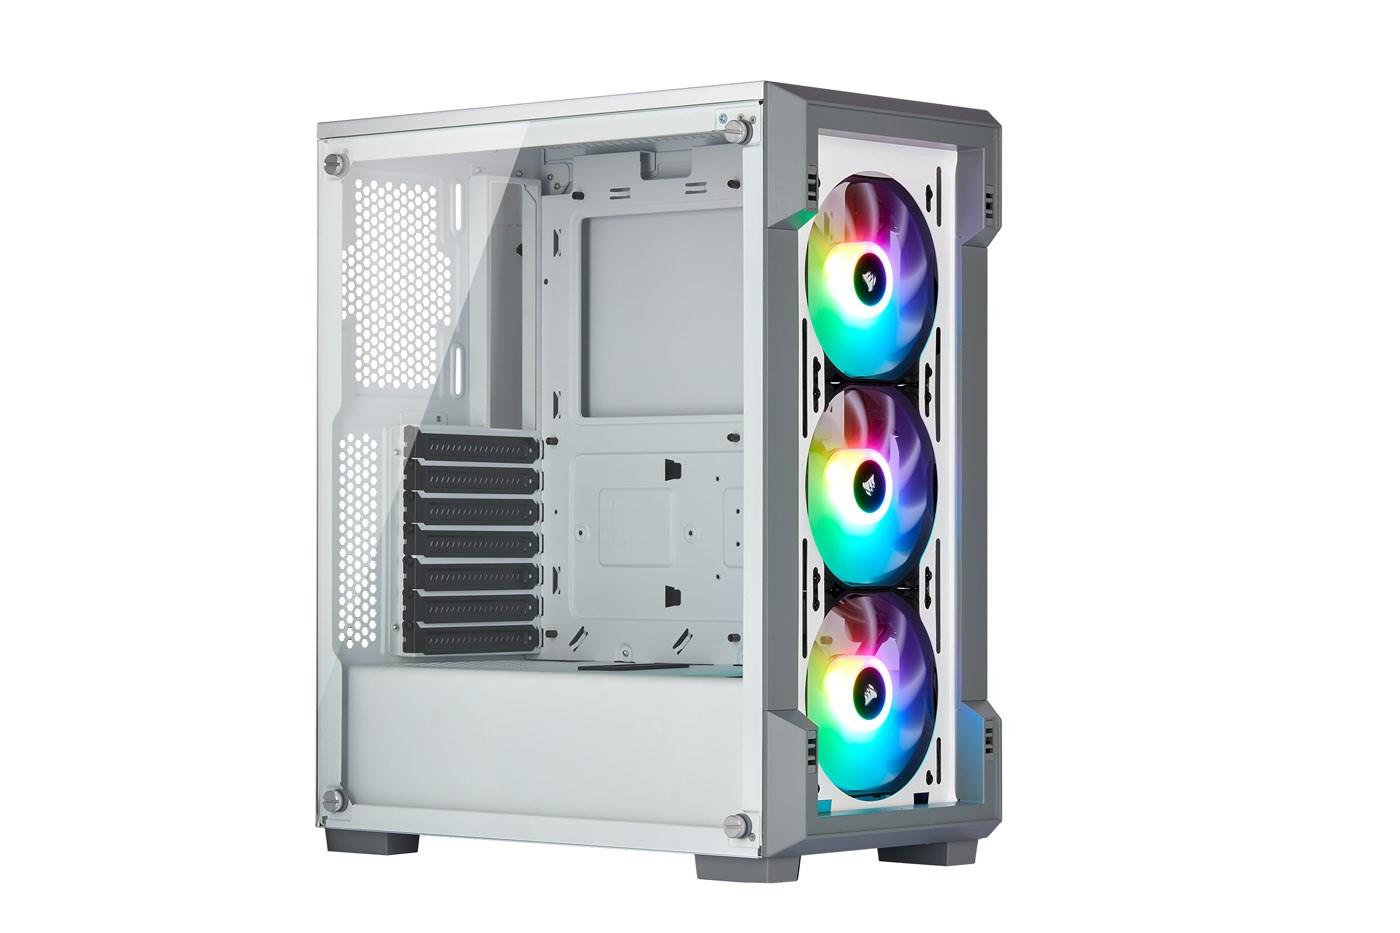 Corsair iCUE 220T RGB Airflow Mid Tower Gaming Case - White USB 3 0